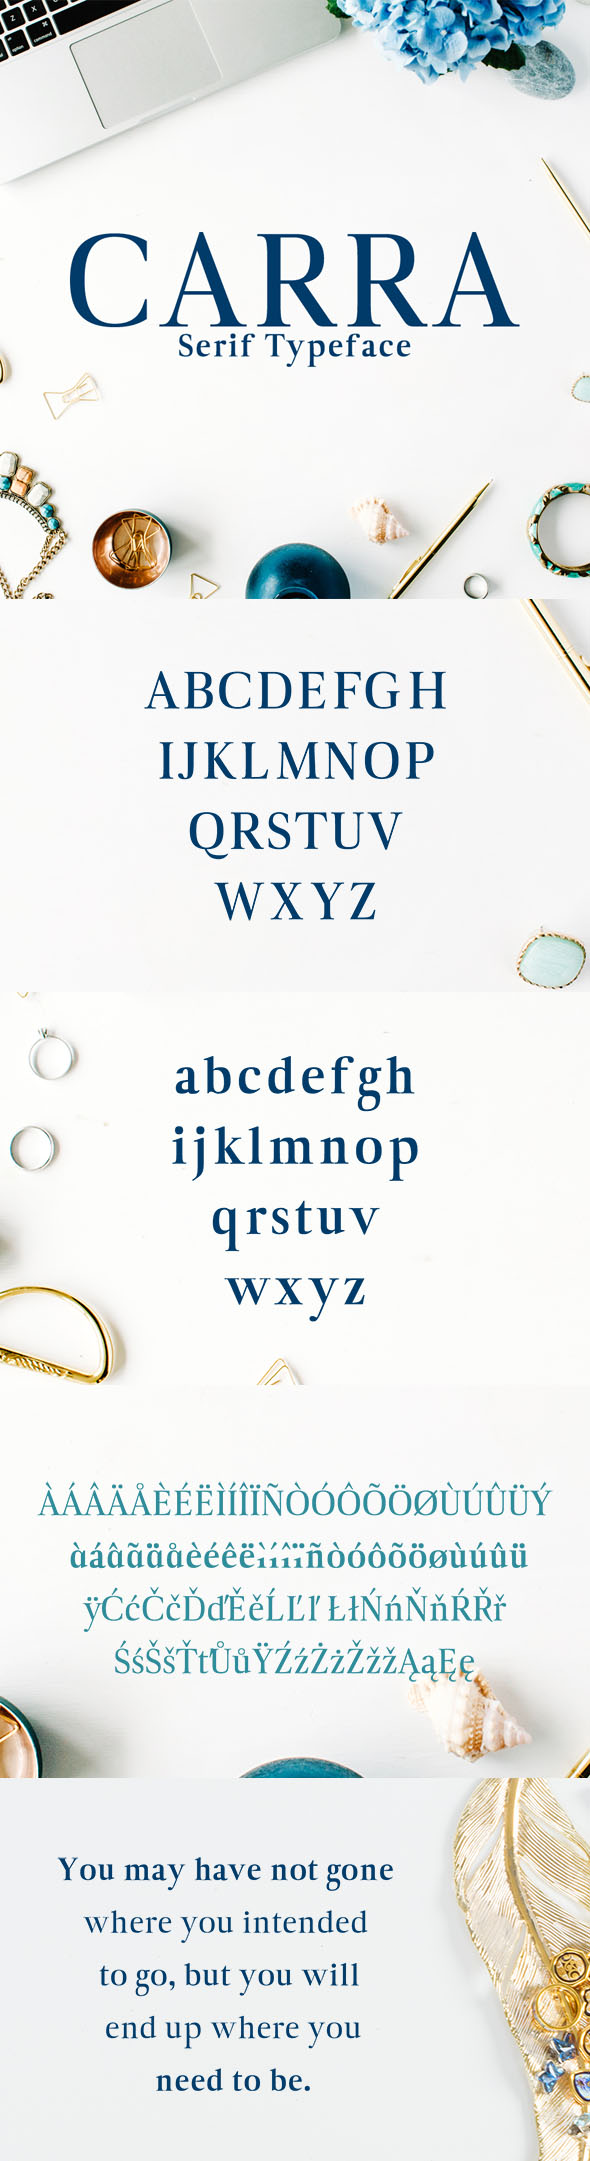 GraphicRiver Carra Serif Typeface 20462480